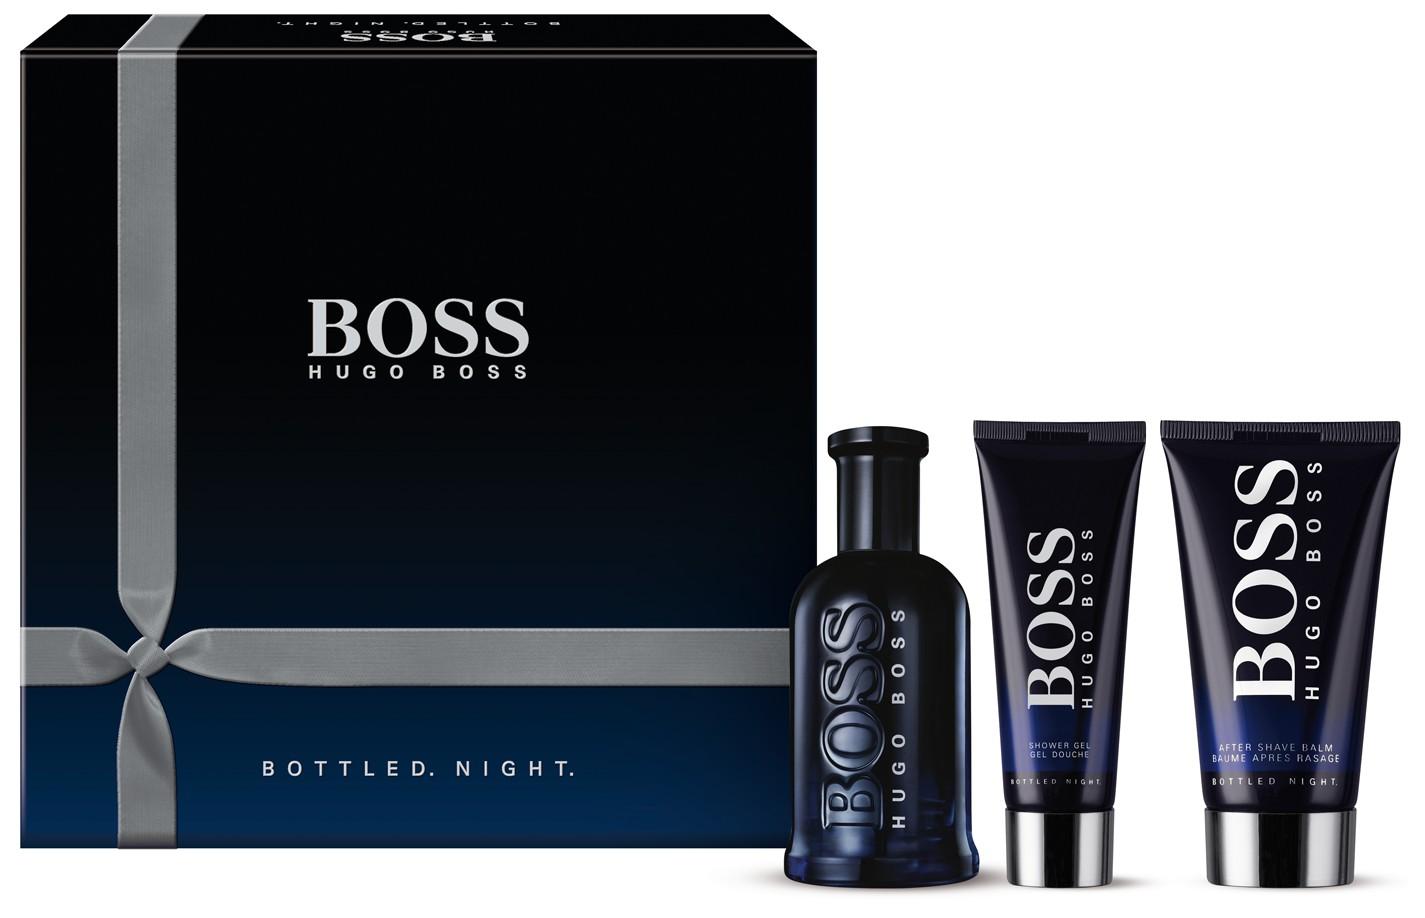 cc422c605 Hugo Boss Bottled Night Gift Box - Sovrana Parfums